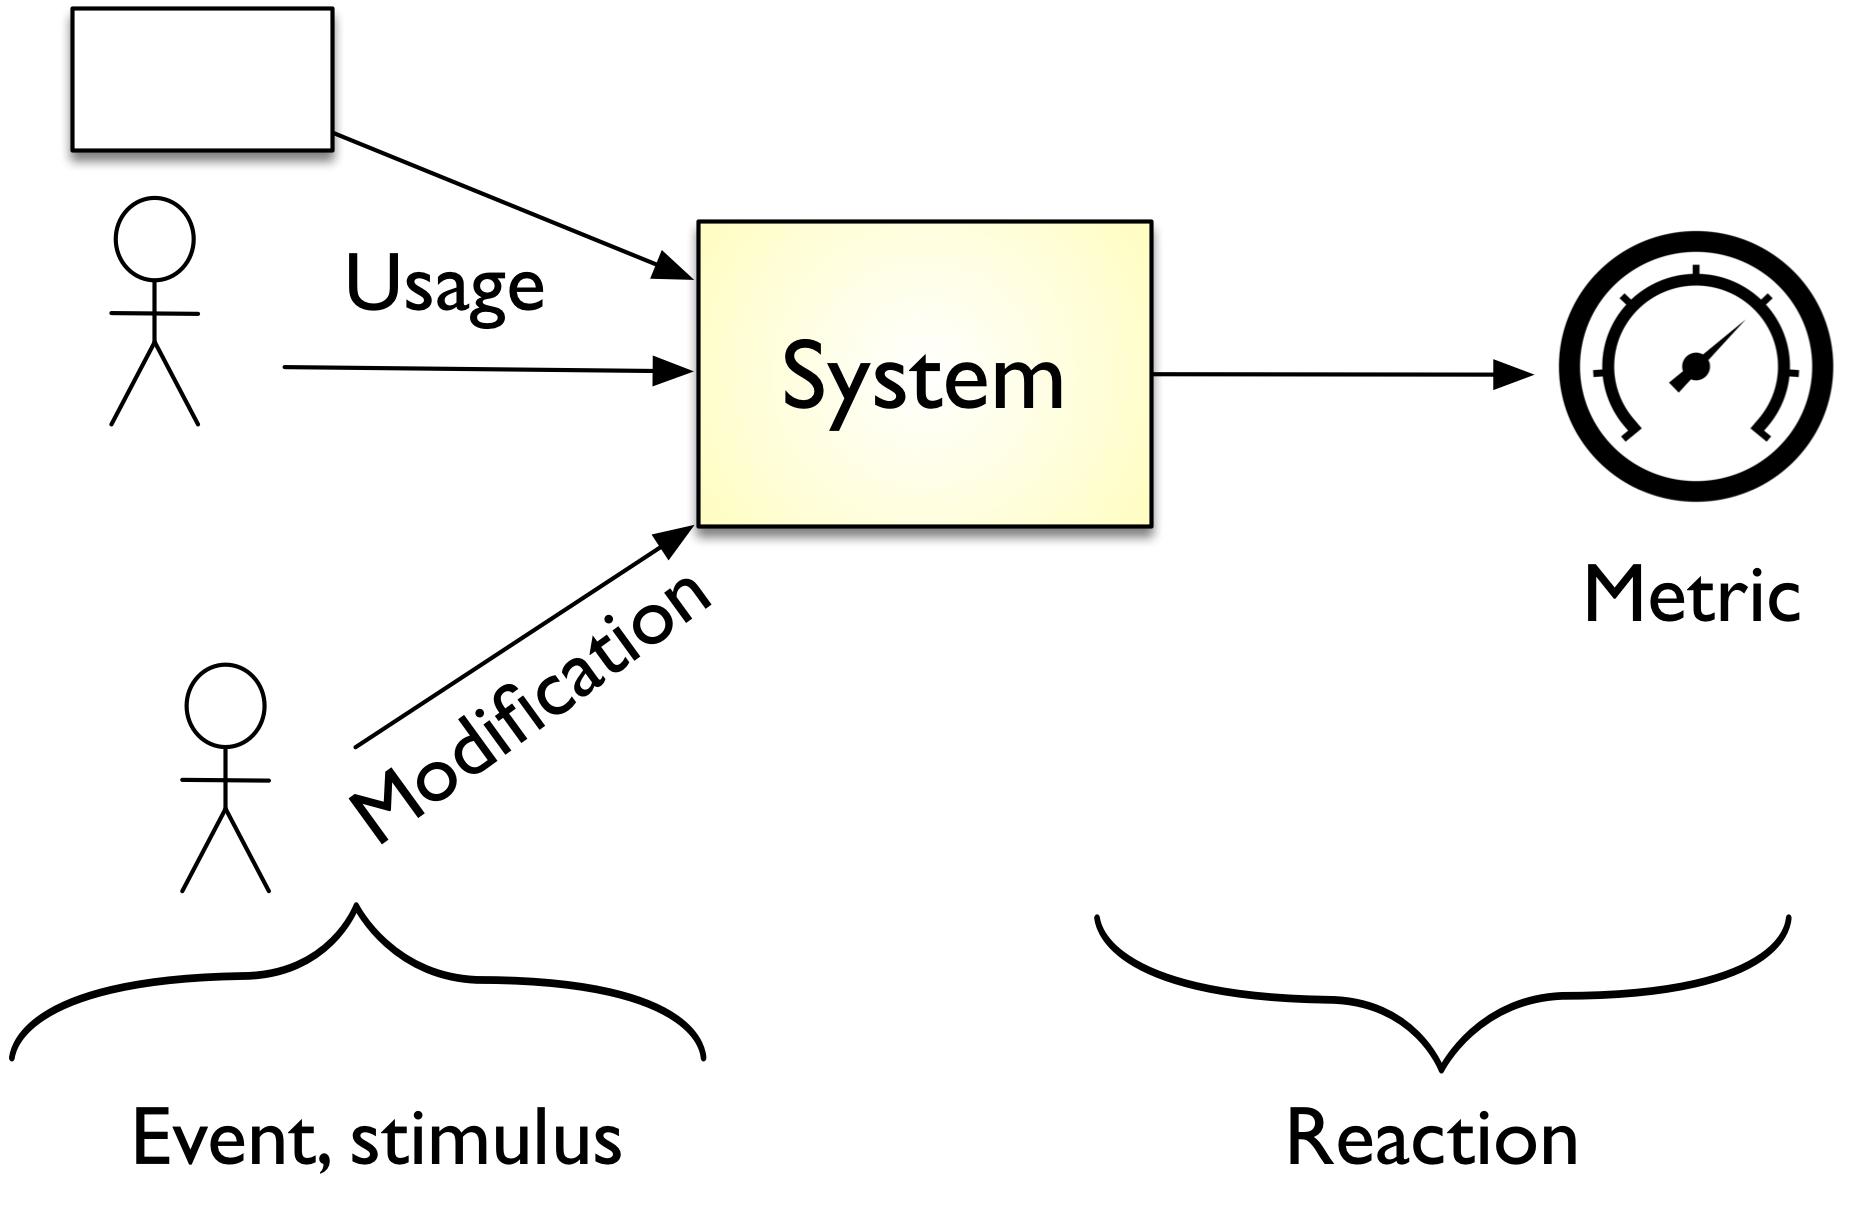 Generic form of (Quality) scenario